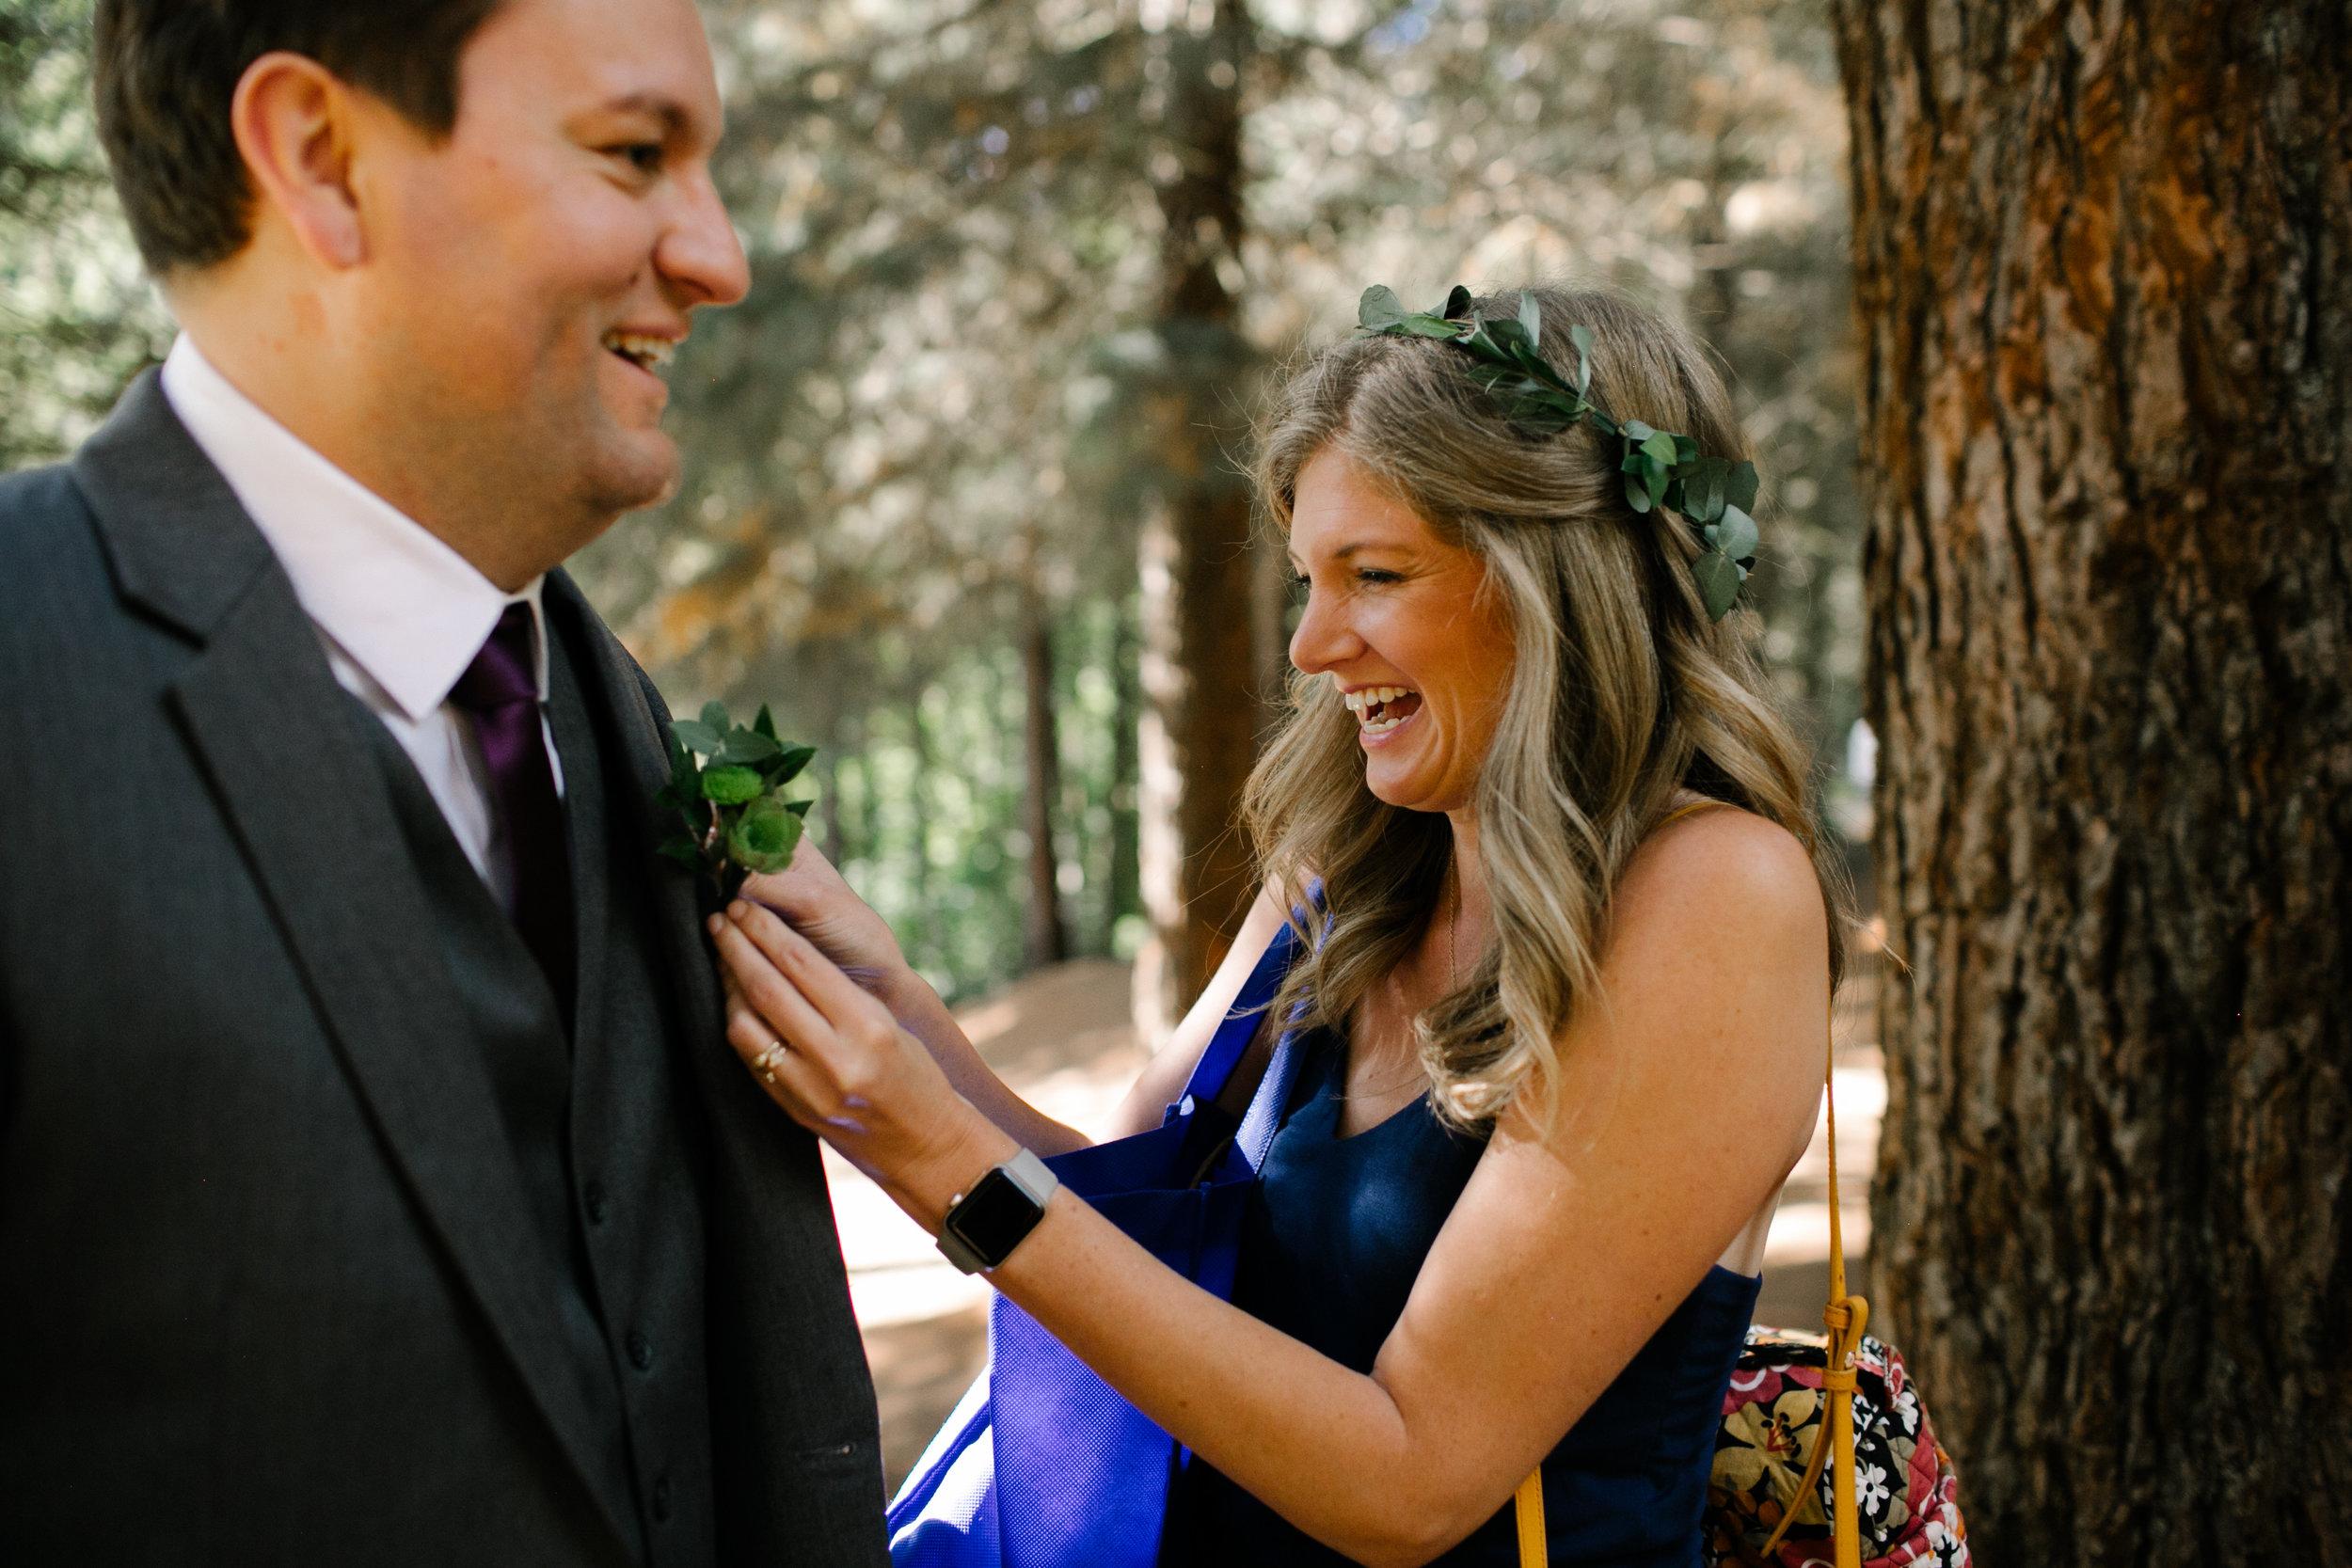 Sevlynn-Photography-Teresa-Chandler-Wedding-11.jpg